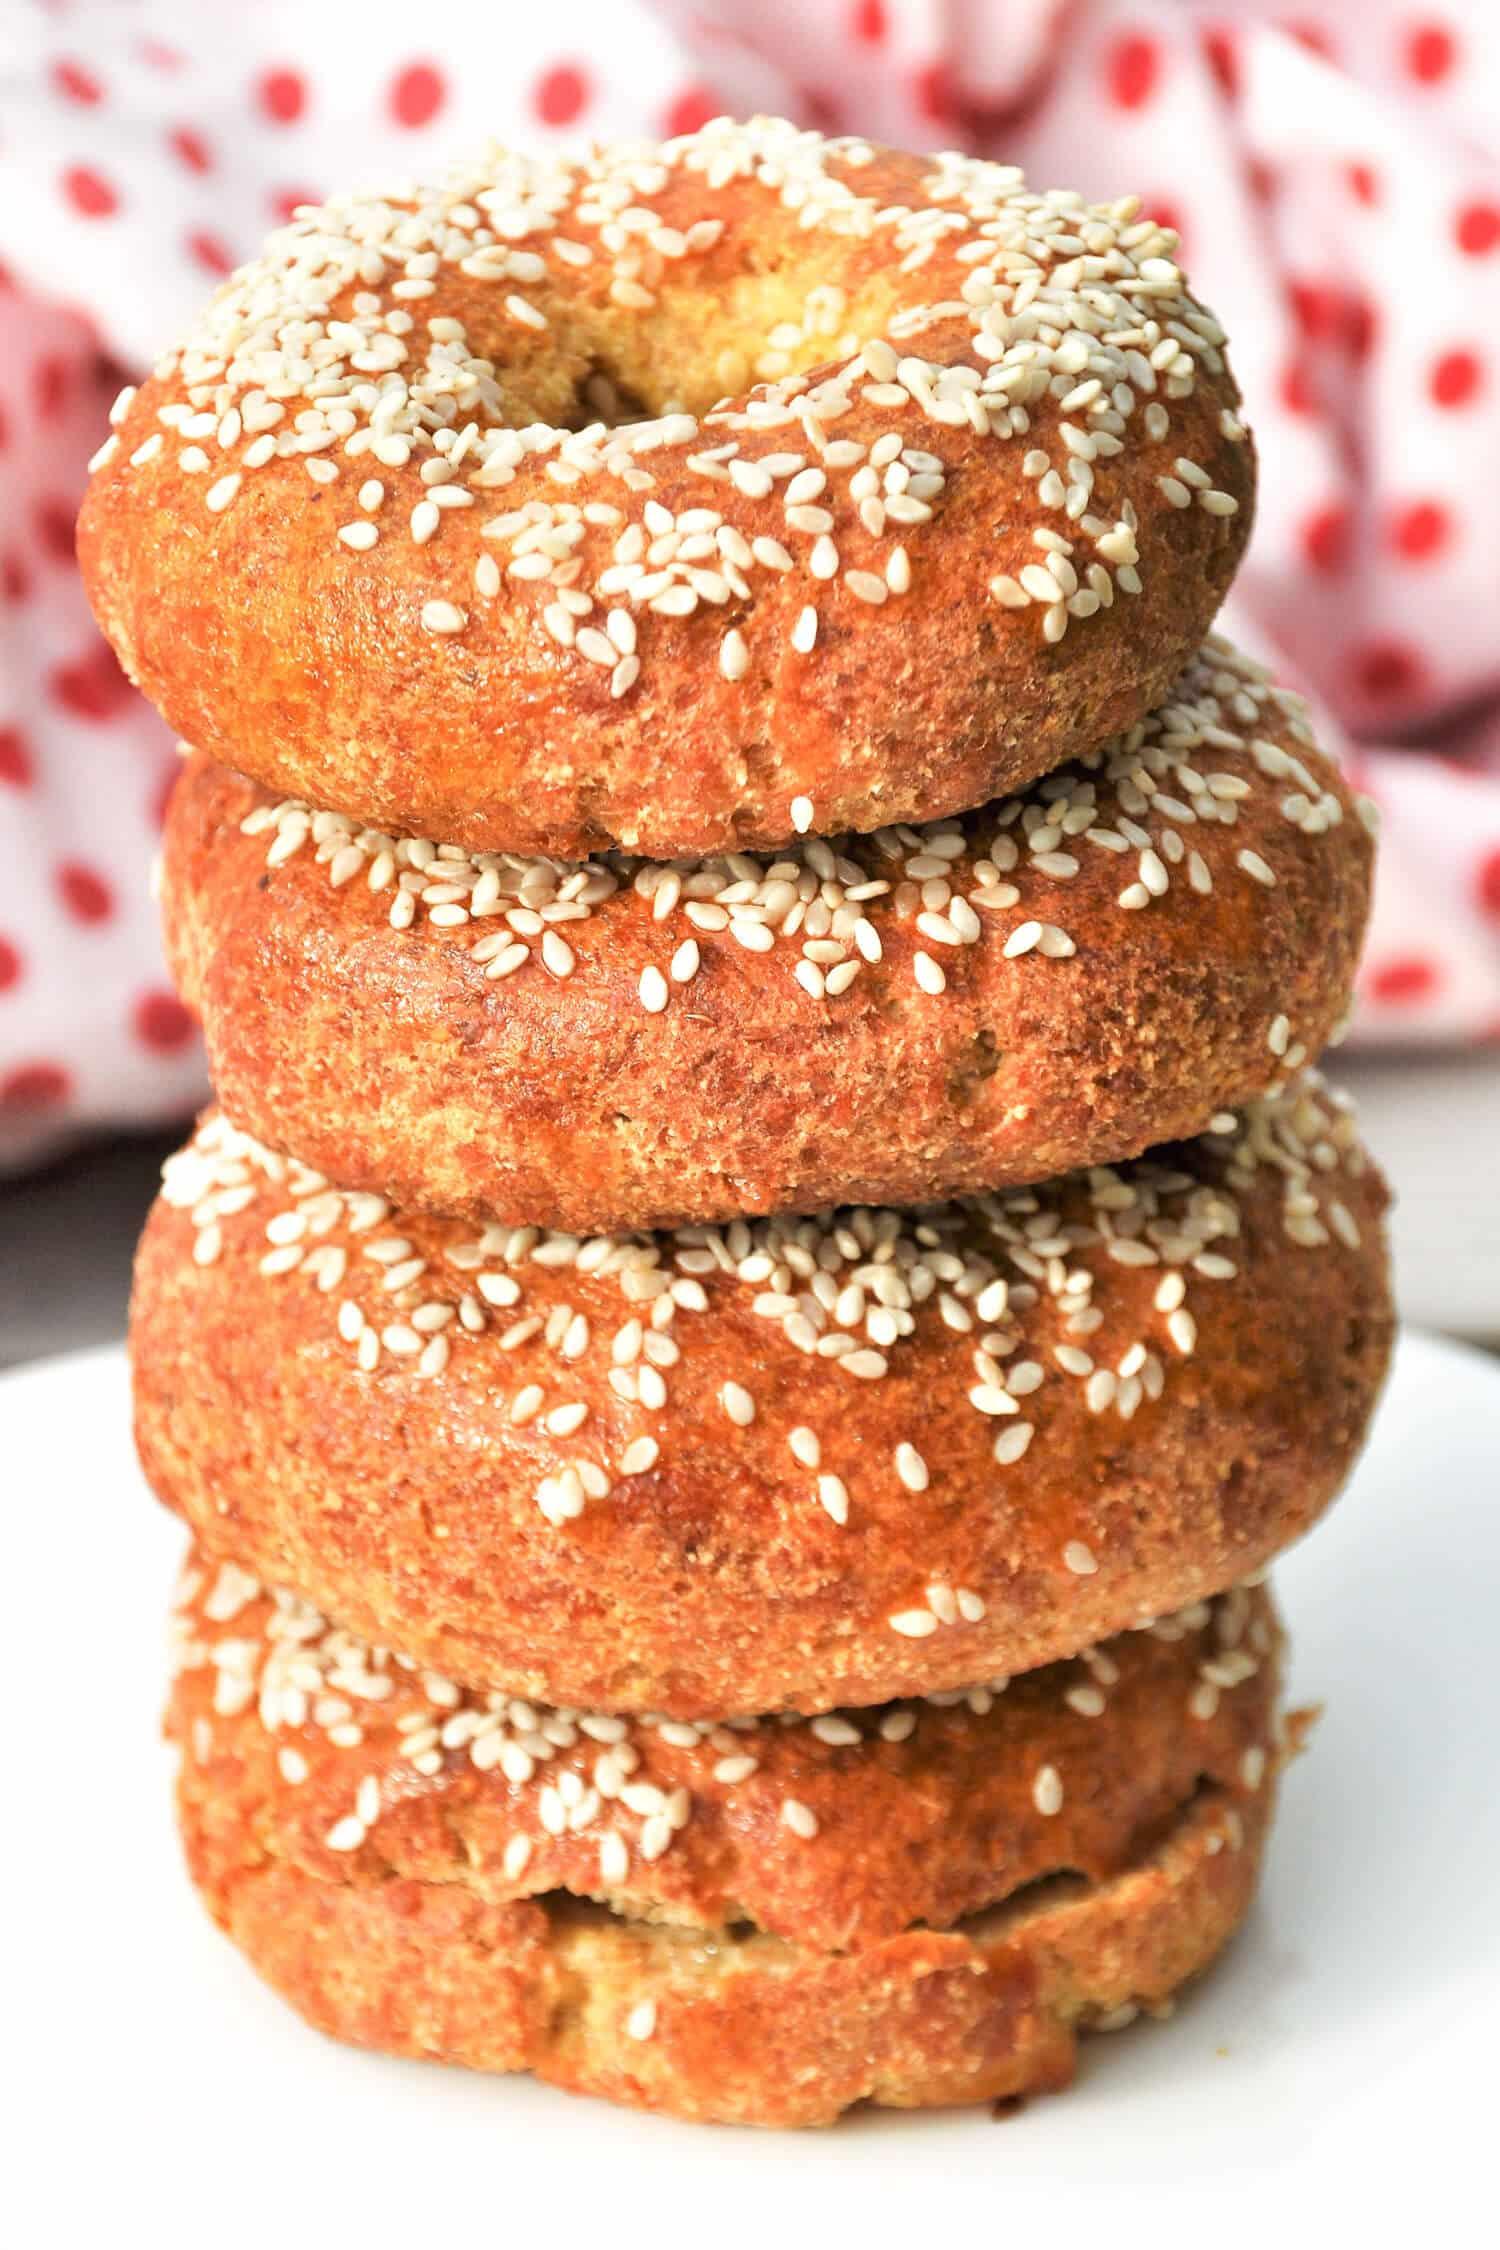 Low Carb Bagel Rezept ohne Kohlenhydrate